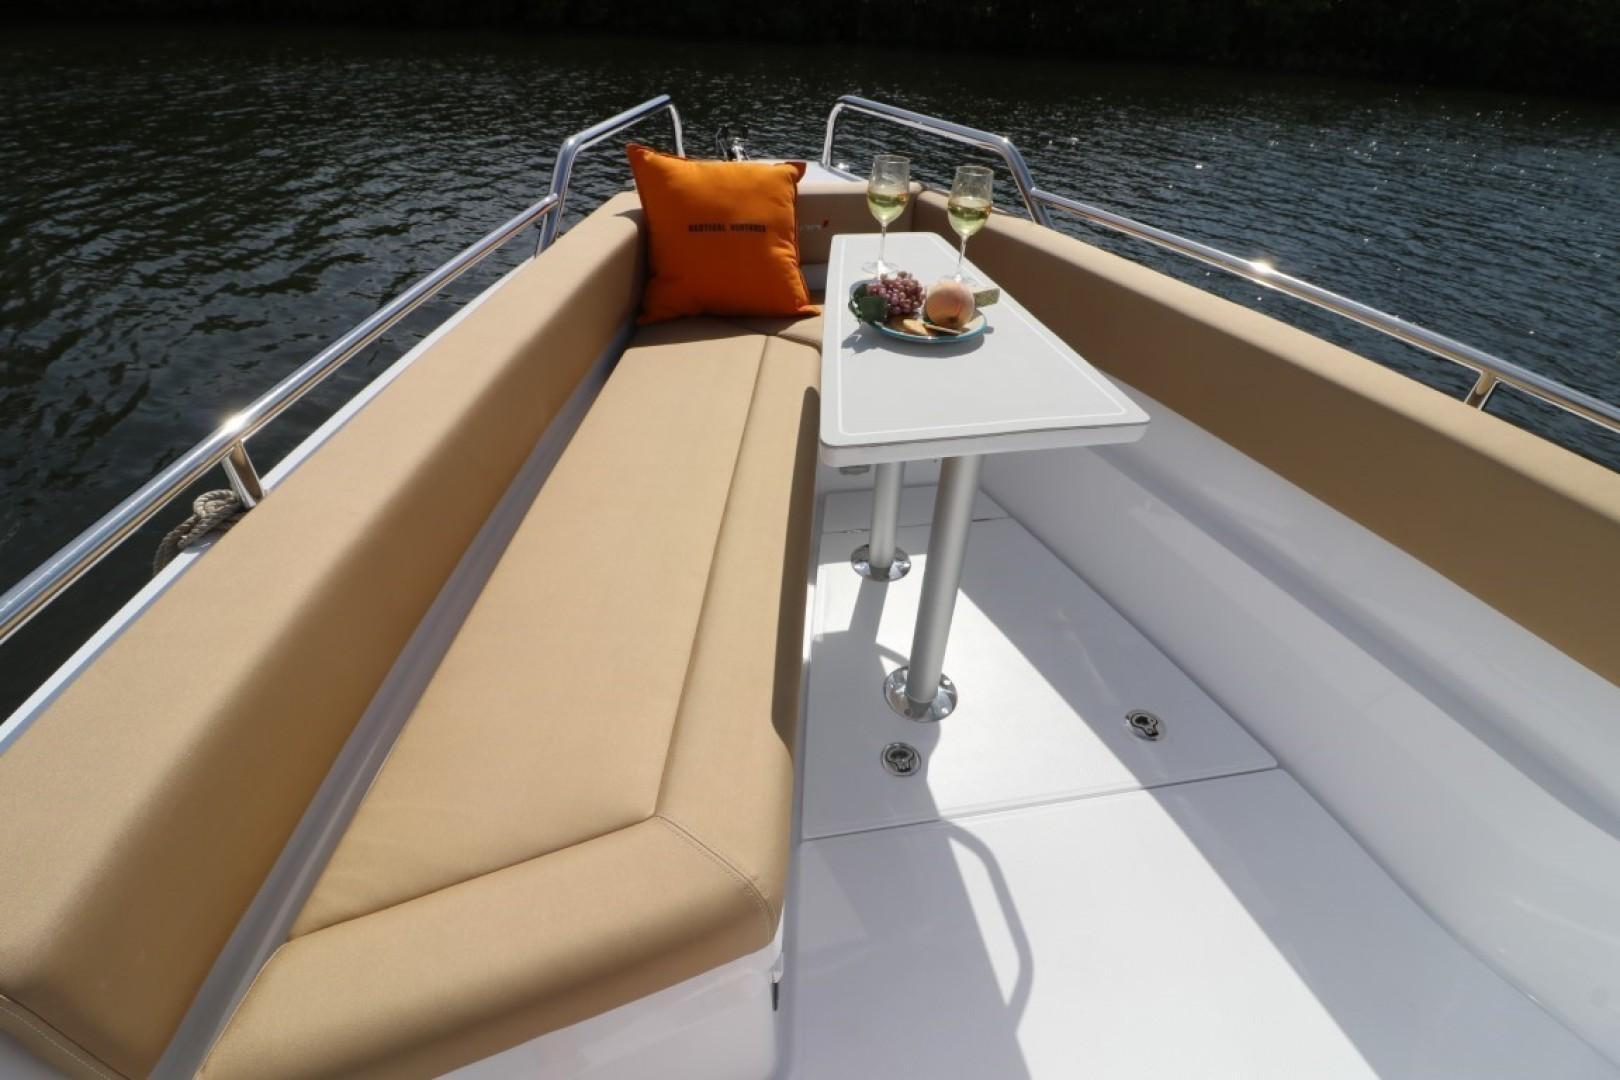 Axopar-28 CABIN 2020-Axopar 28 CABIN Fort Lauderdale-Florida-United States-1586683 | Thumbnail